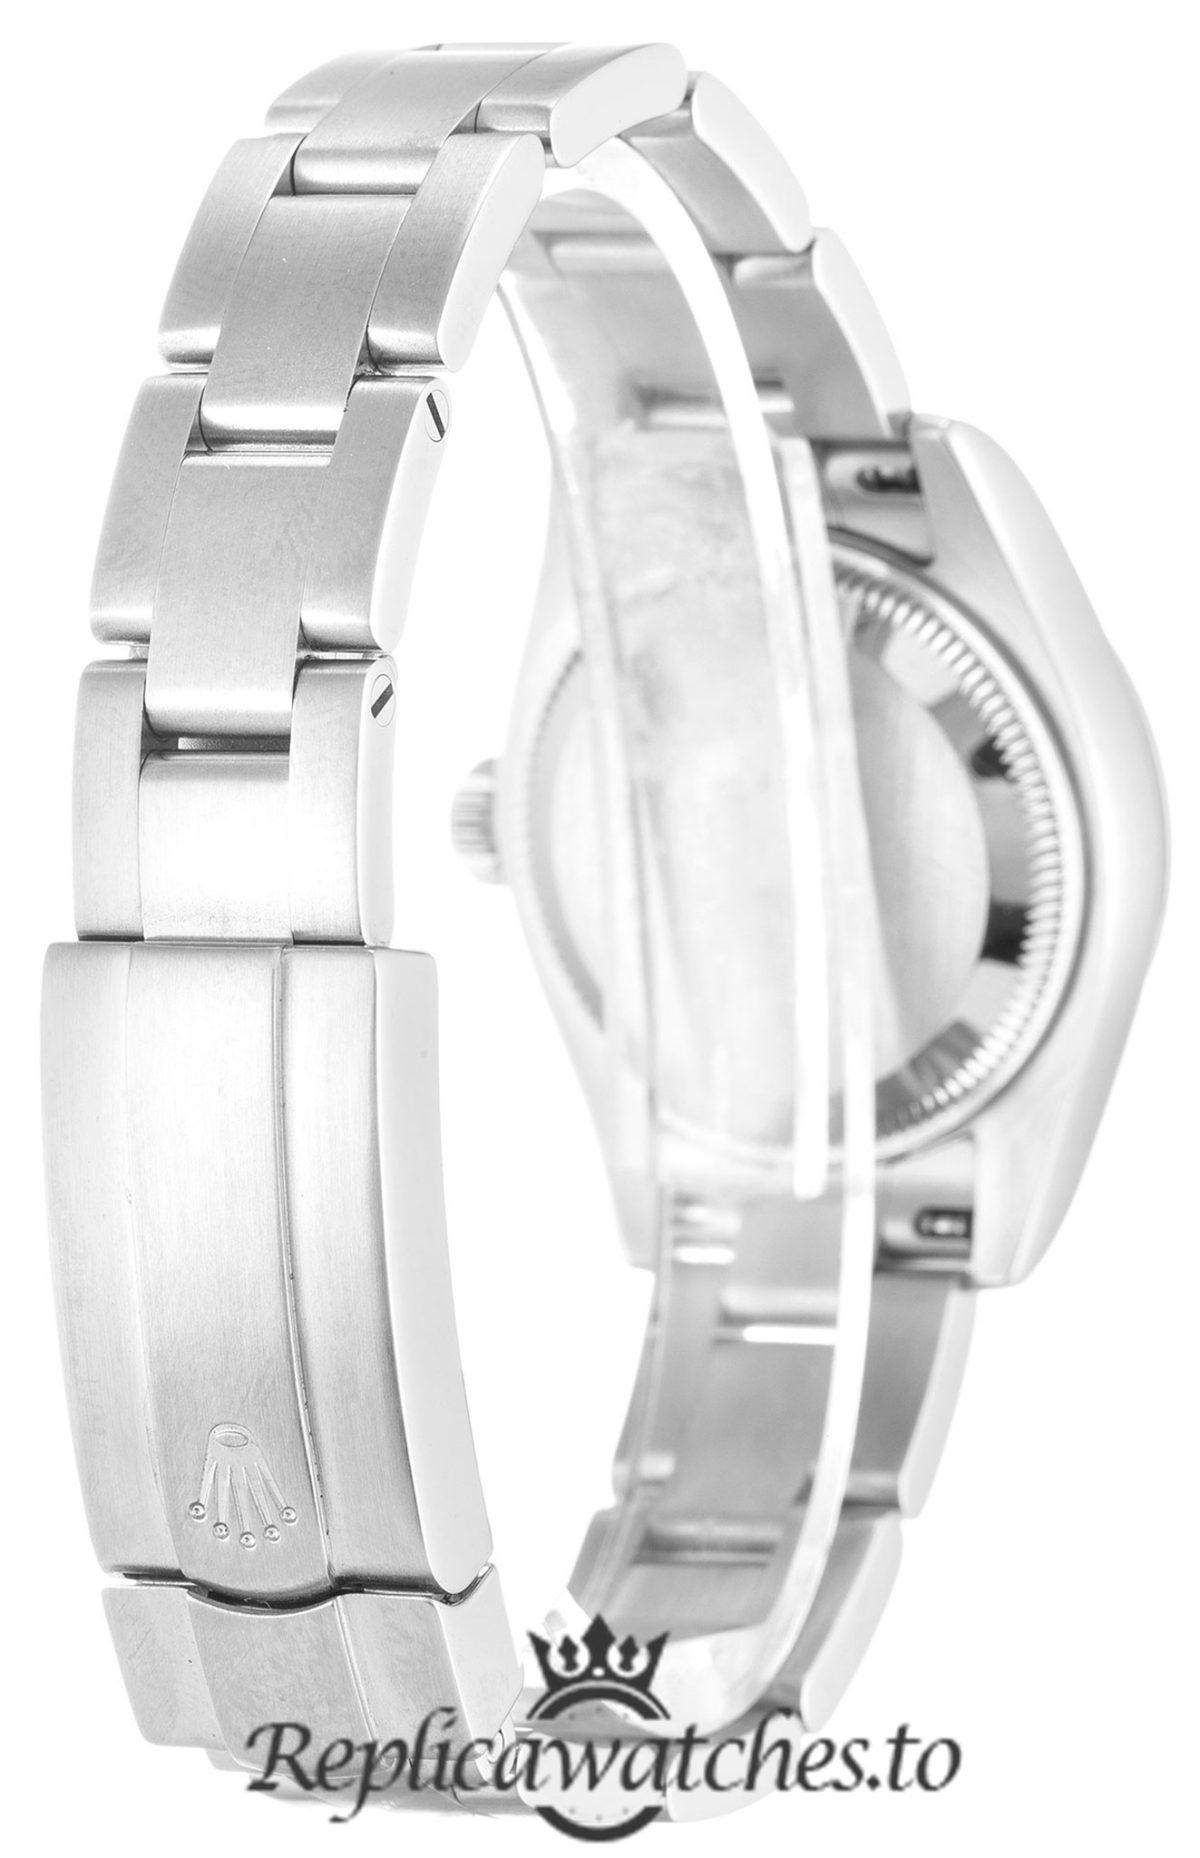 Rolex Oyster Perpetual Replica 176234 Silver Strap 26MM